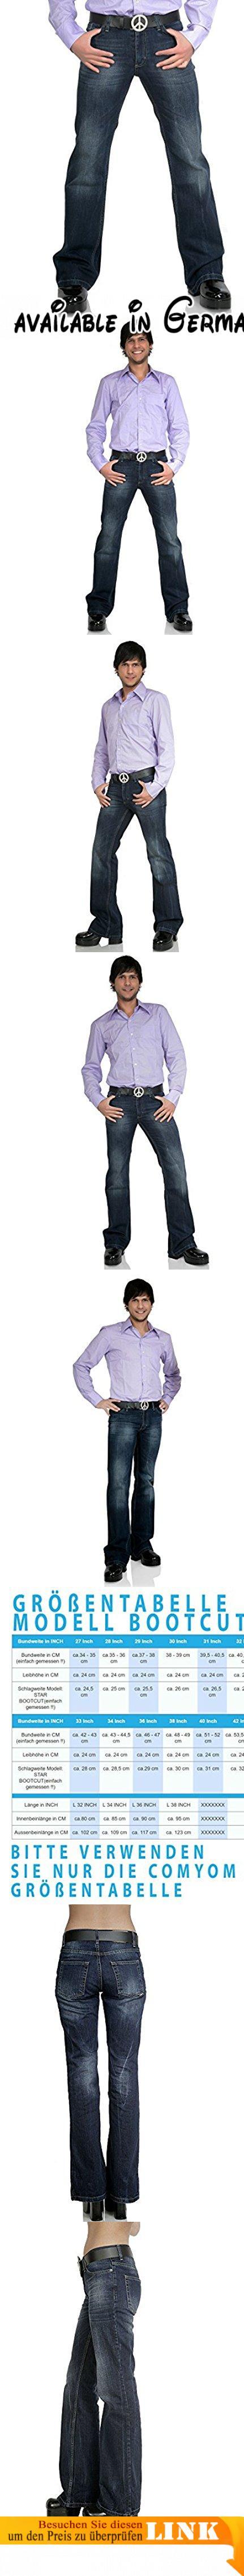 Bootcut Jeans Star Burn dunkelblau 34/36.  #Apparel #PANTS